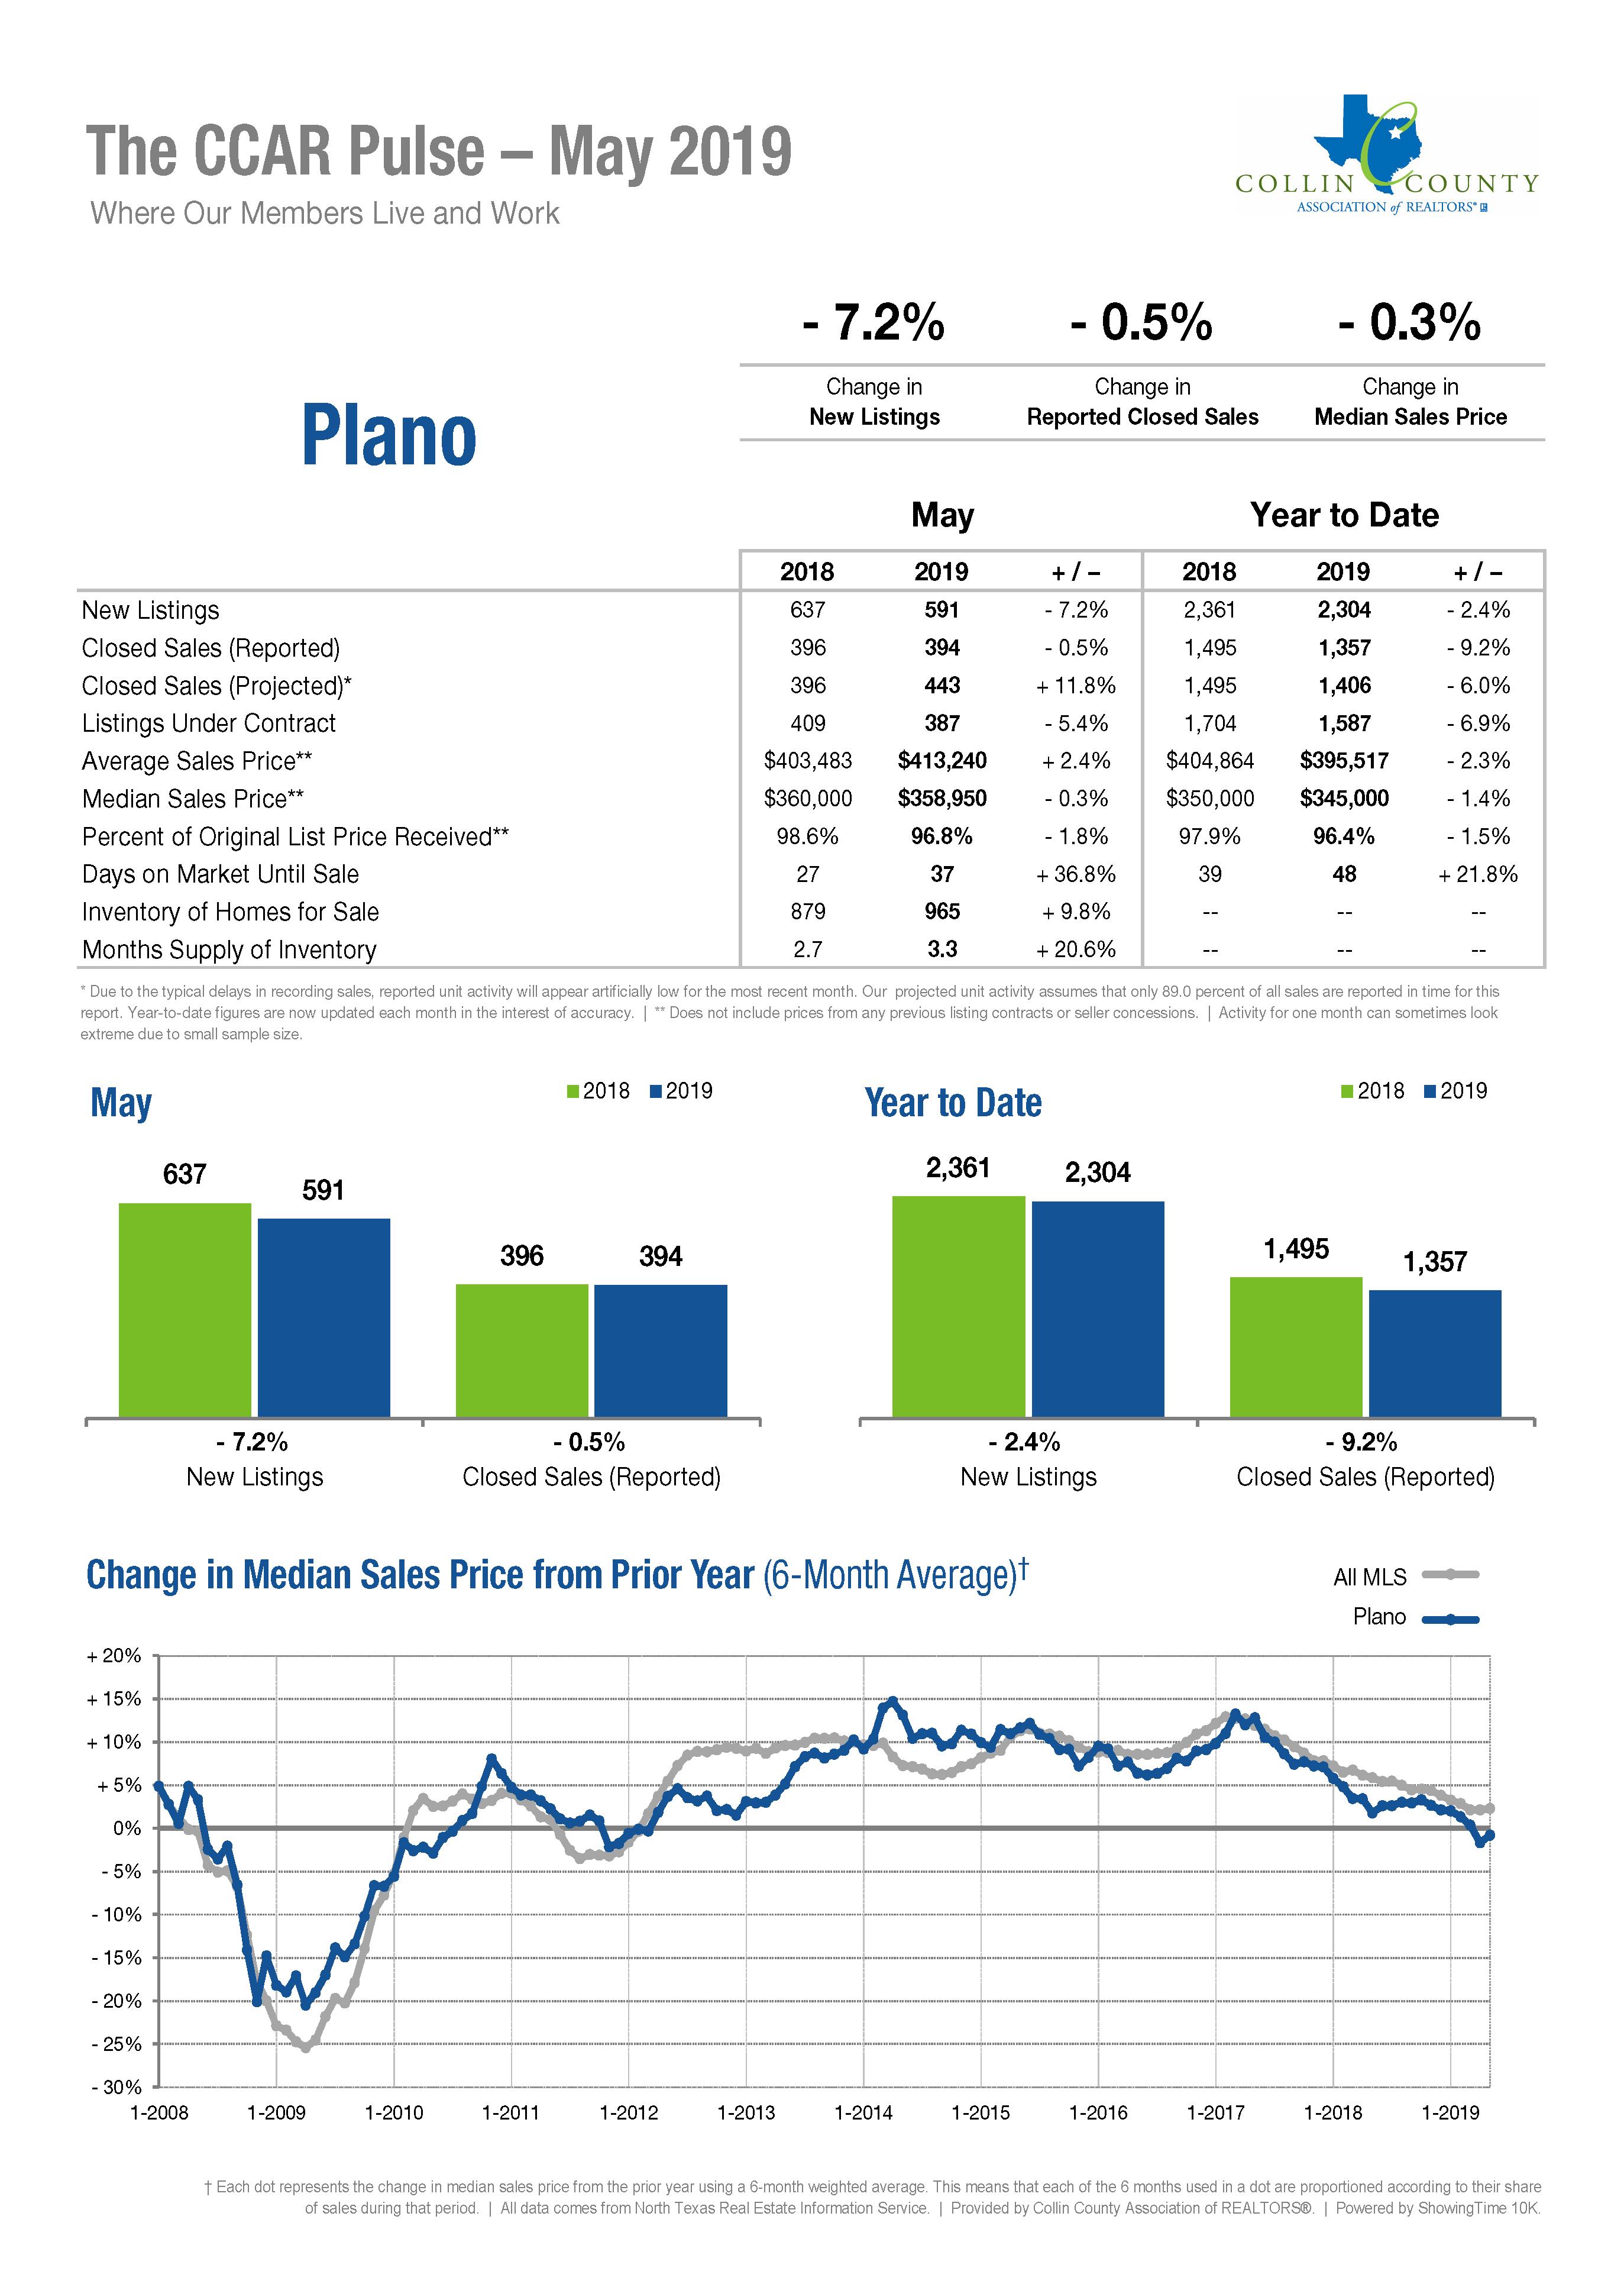 Plano Real Estate Market Statistics - May 2019